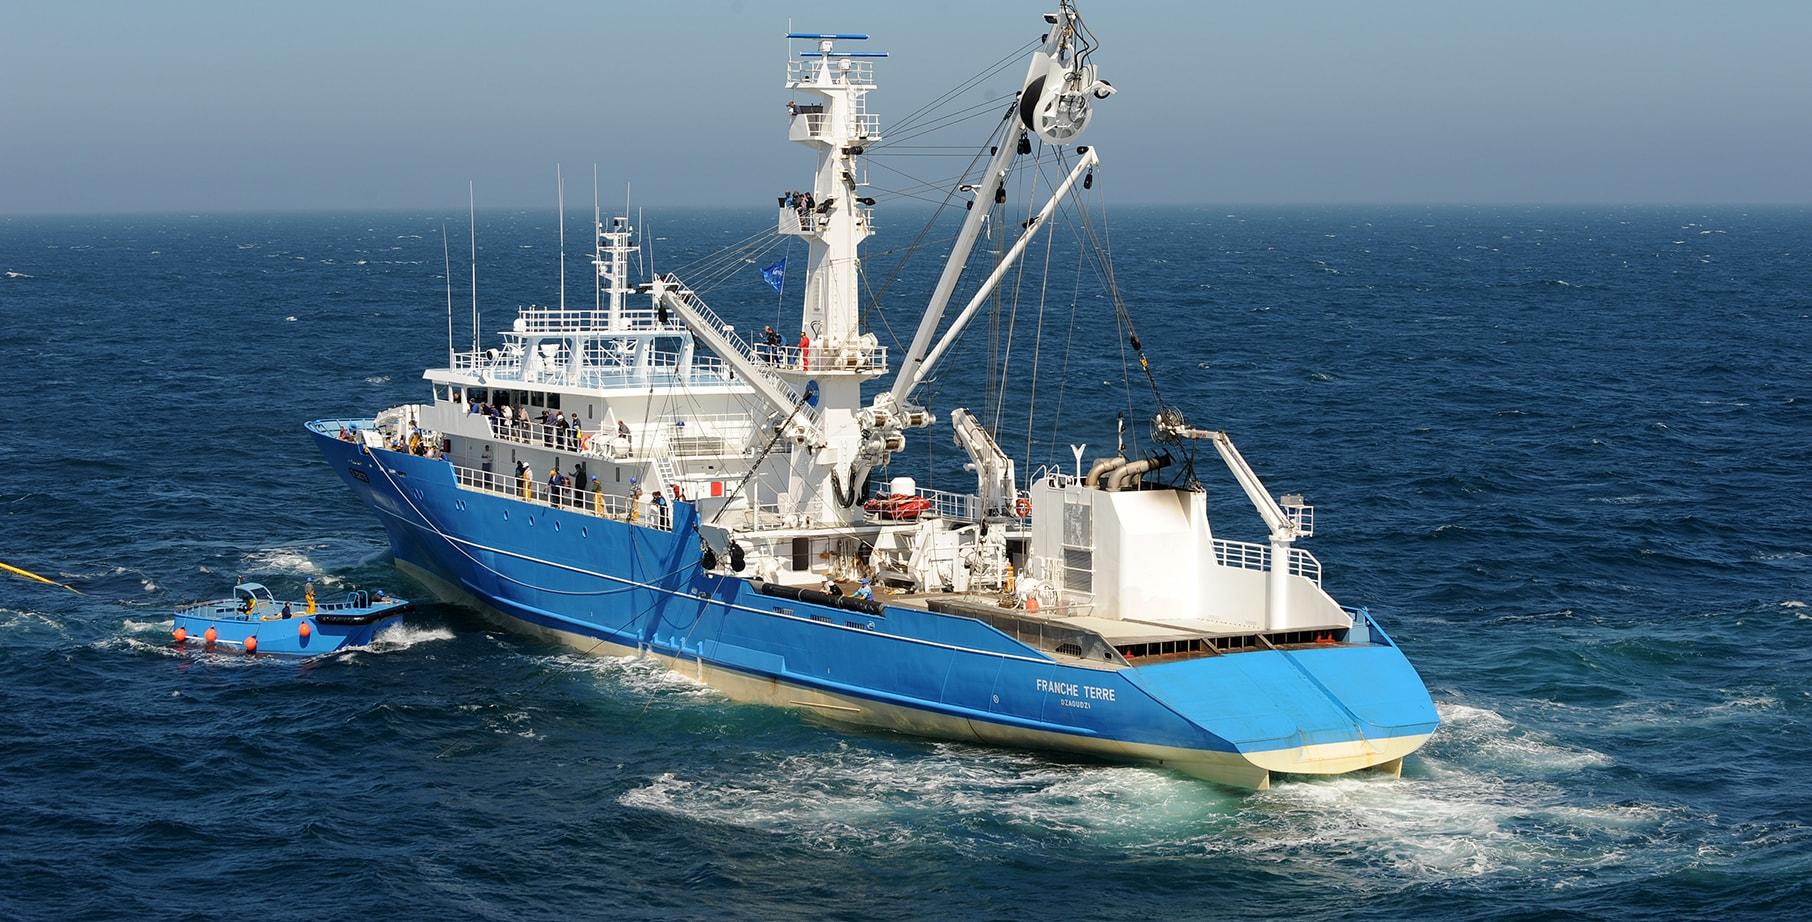 SAPMER fishing vessels - Tuna purse seiner FRANCHE TERRE